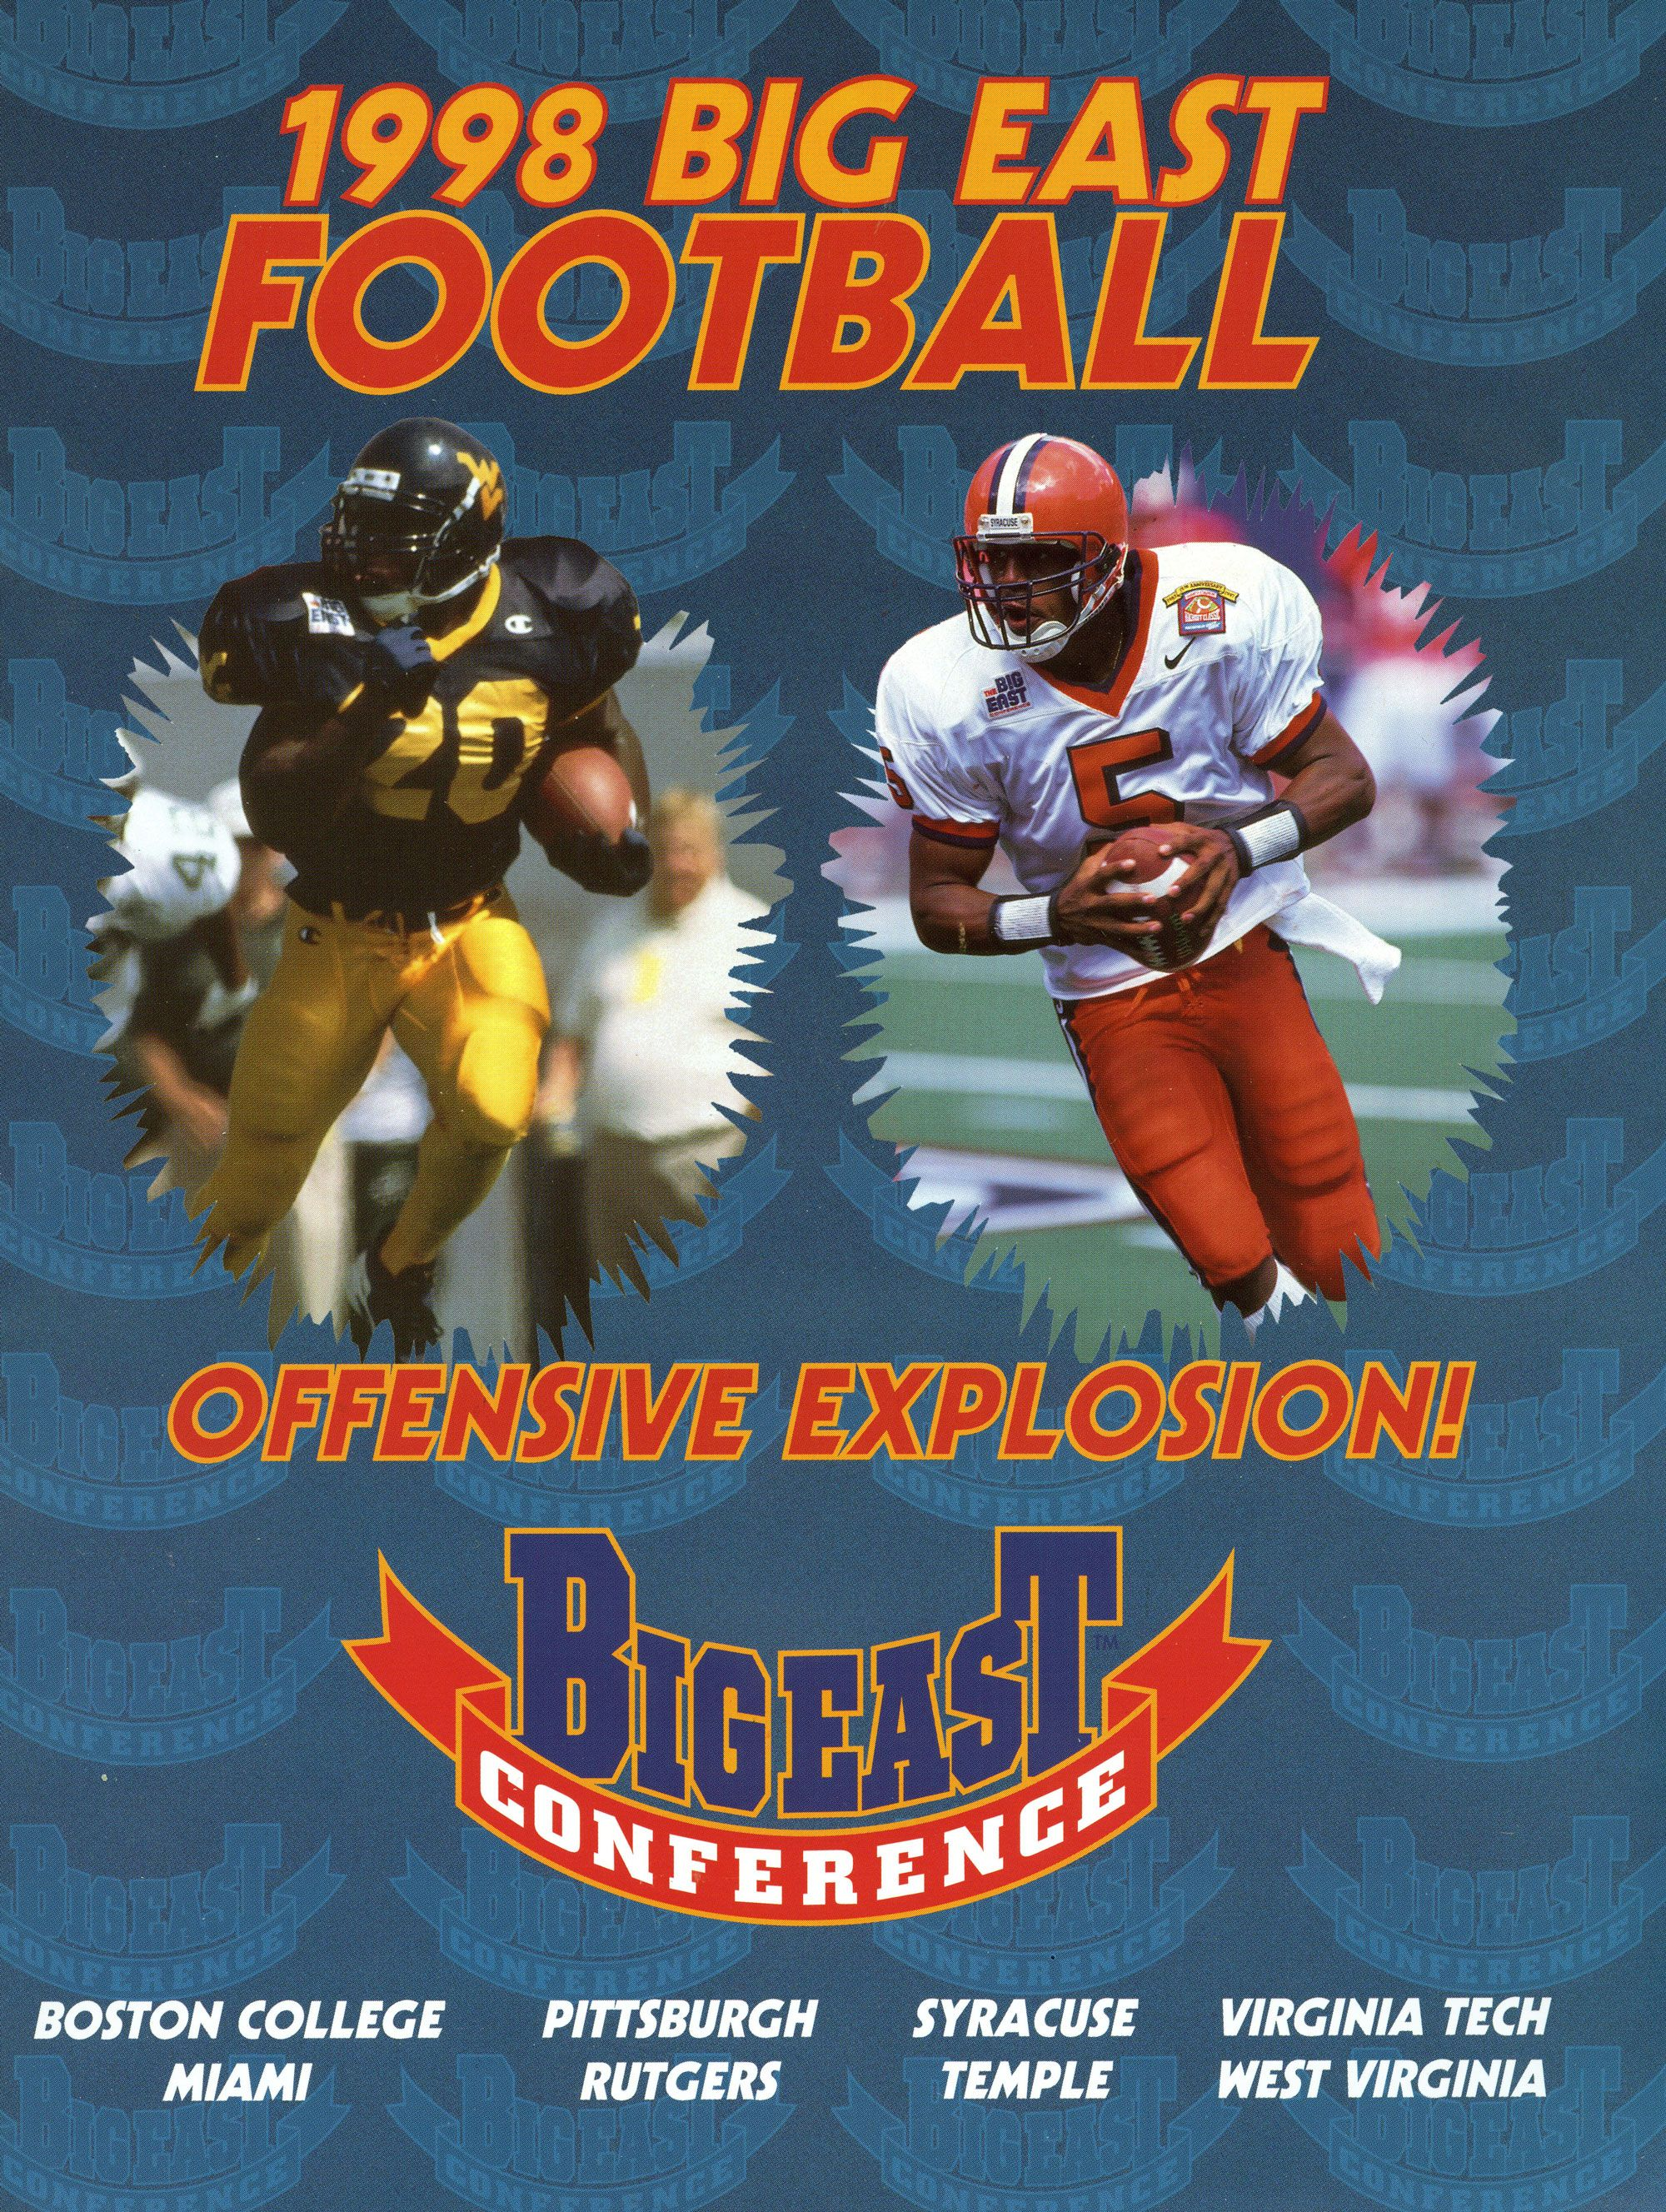 1998 BIG EAST Football Media Guide Cover bemediaday